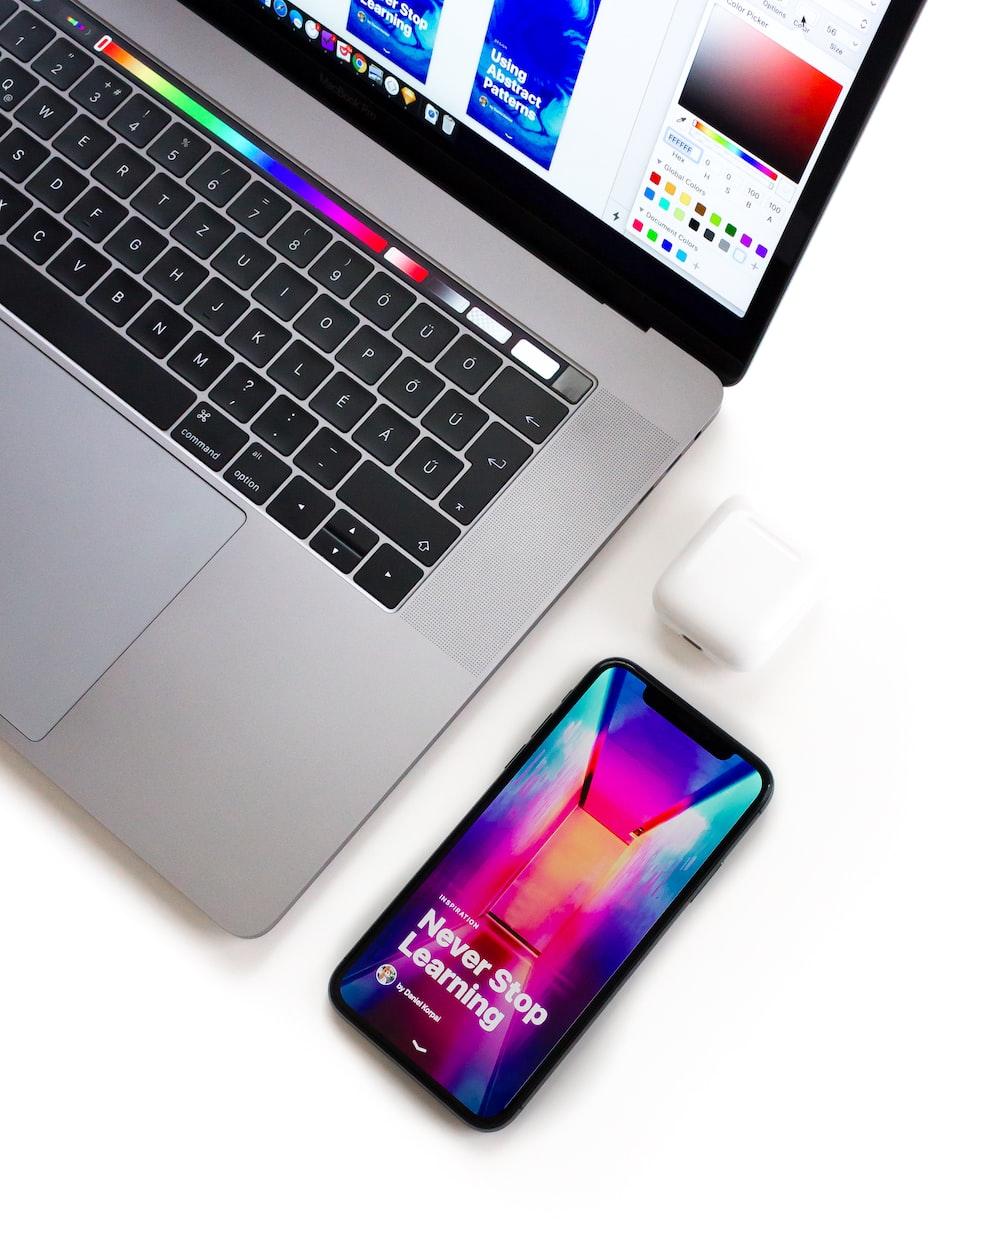 laptop near the smartphone